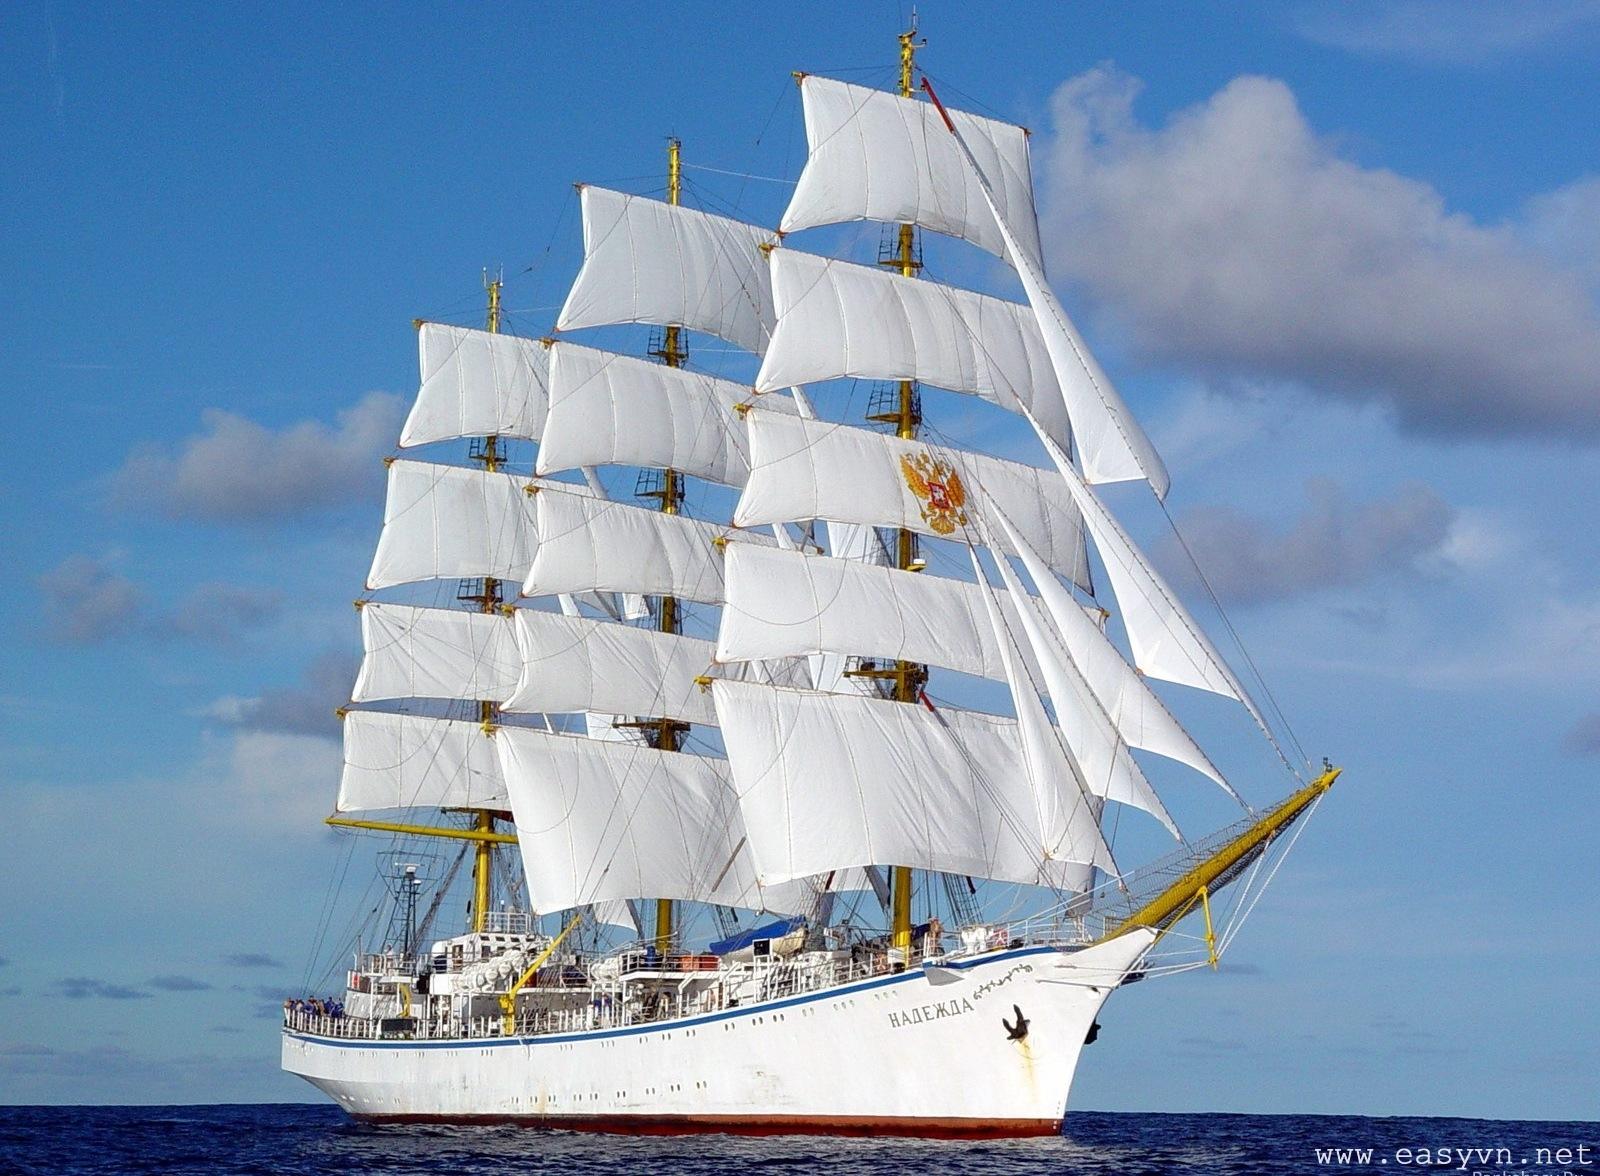 Cruise ship wallpaper 08326 baltana.